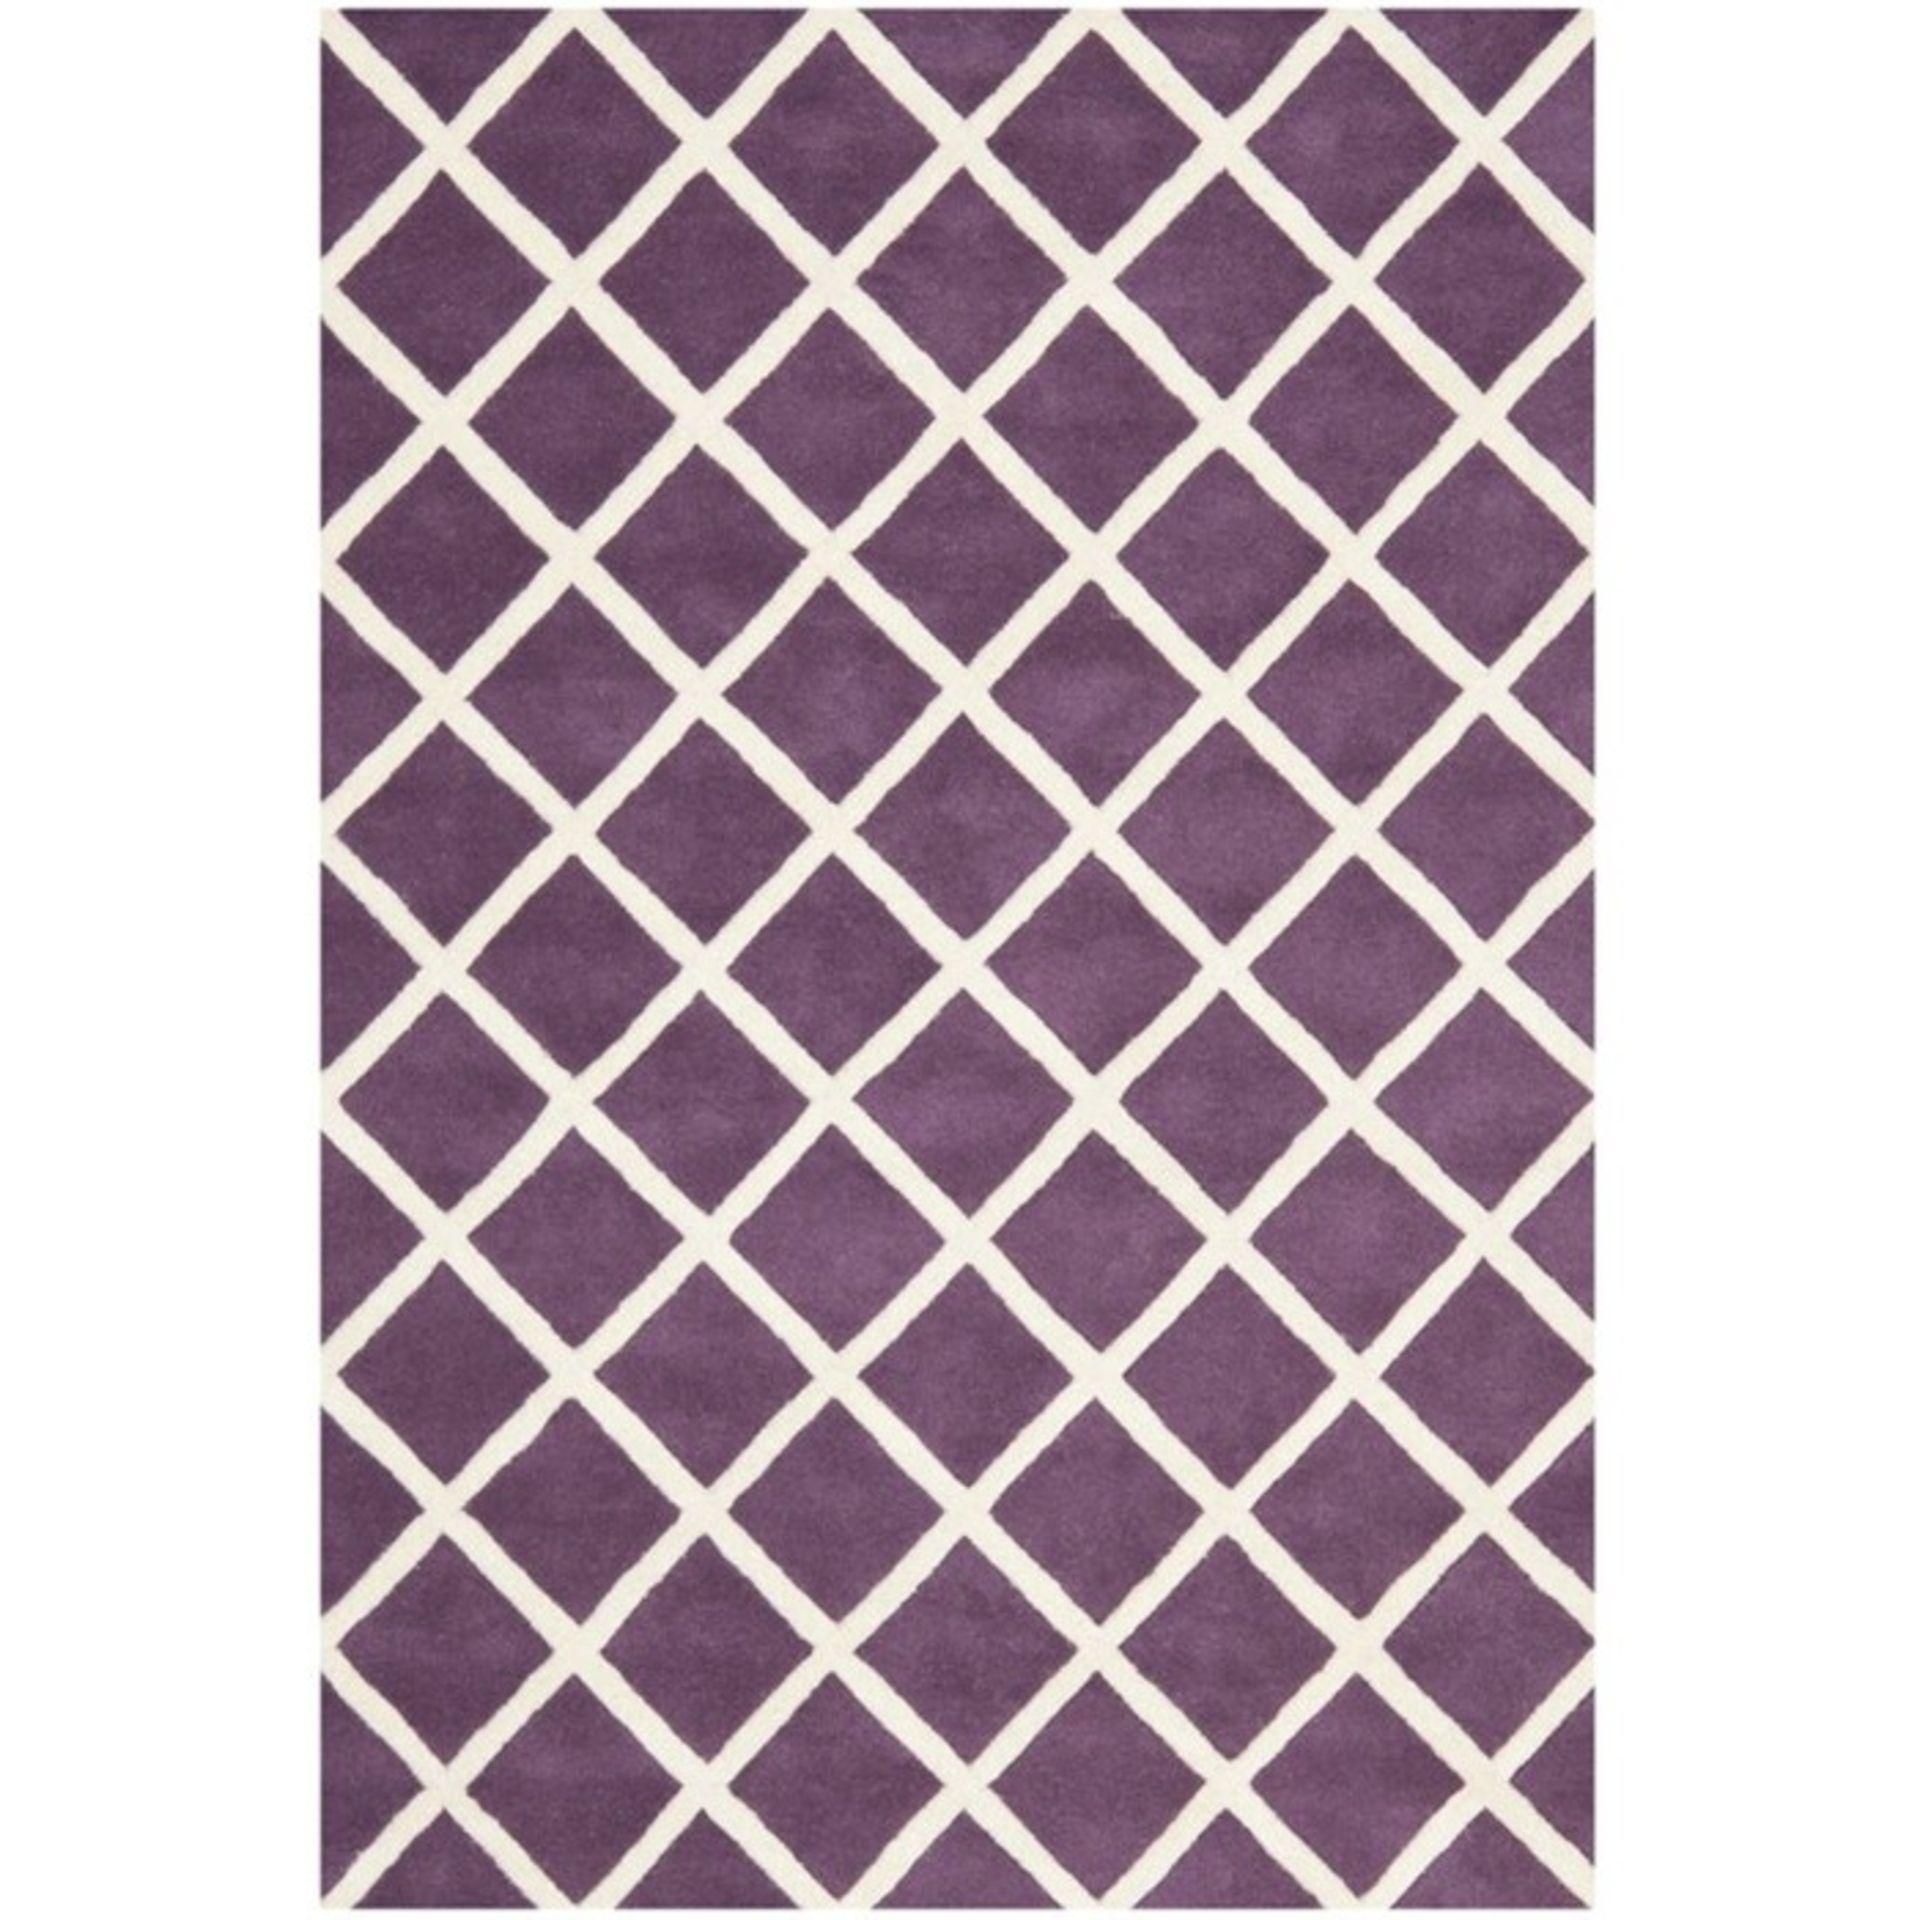 Benford Handmade Tufted Wool Purple Rug Rug Size: Rectangle 182 x 274cm (HL7 - 3/19 -QQ6536.